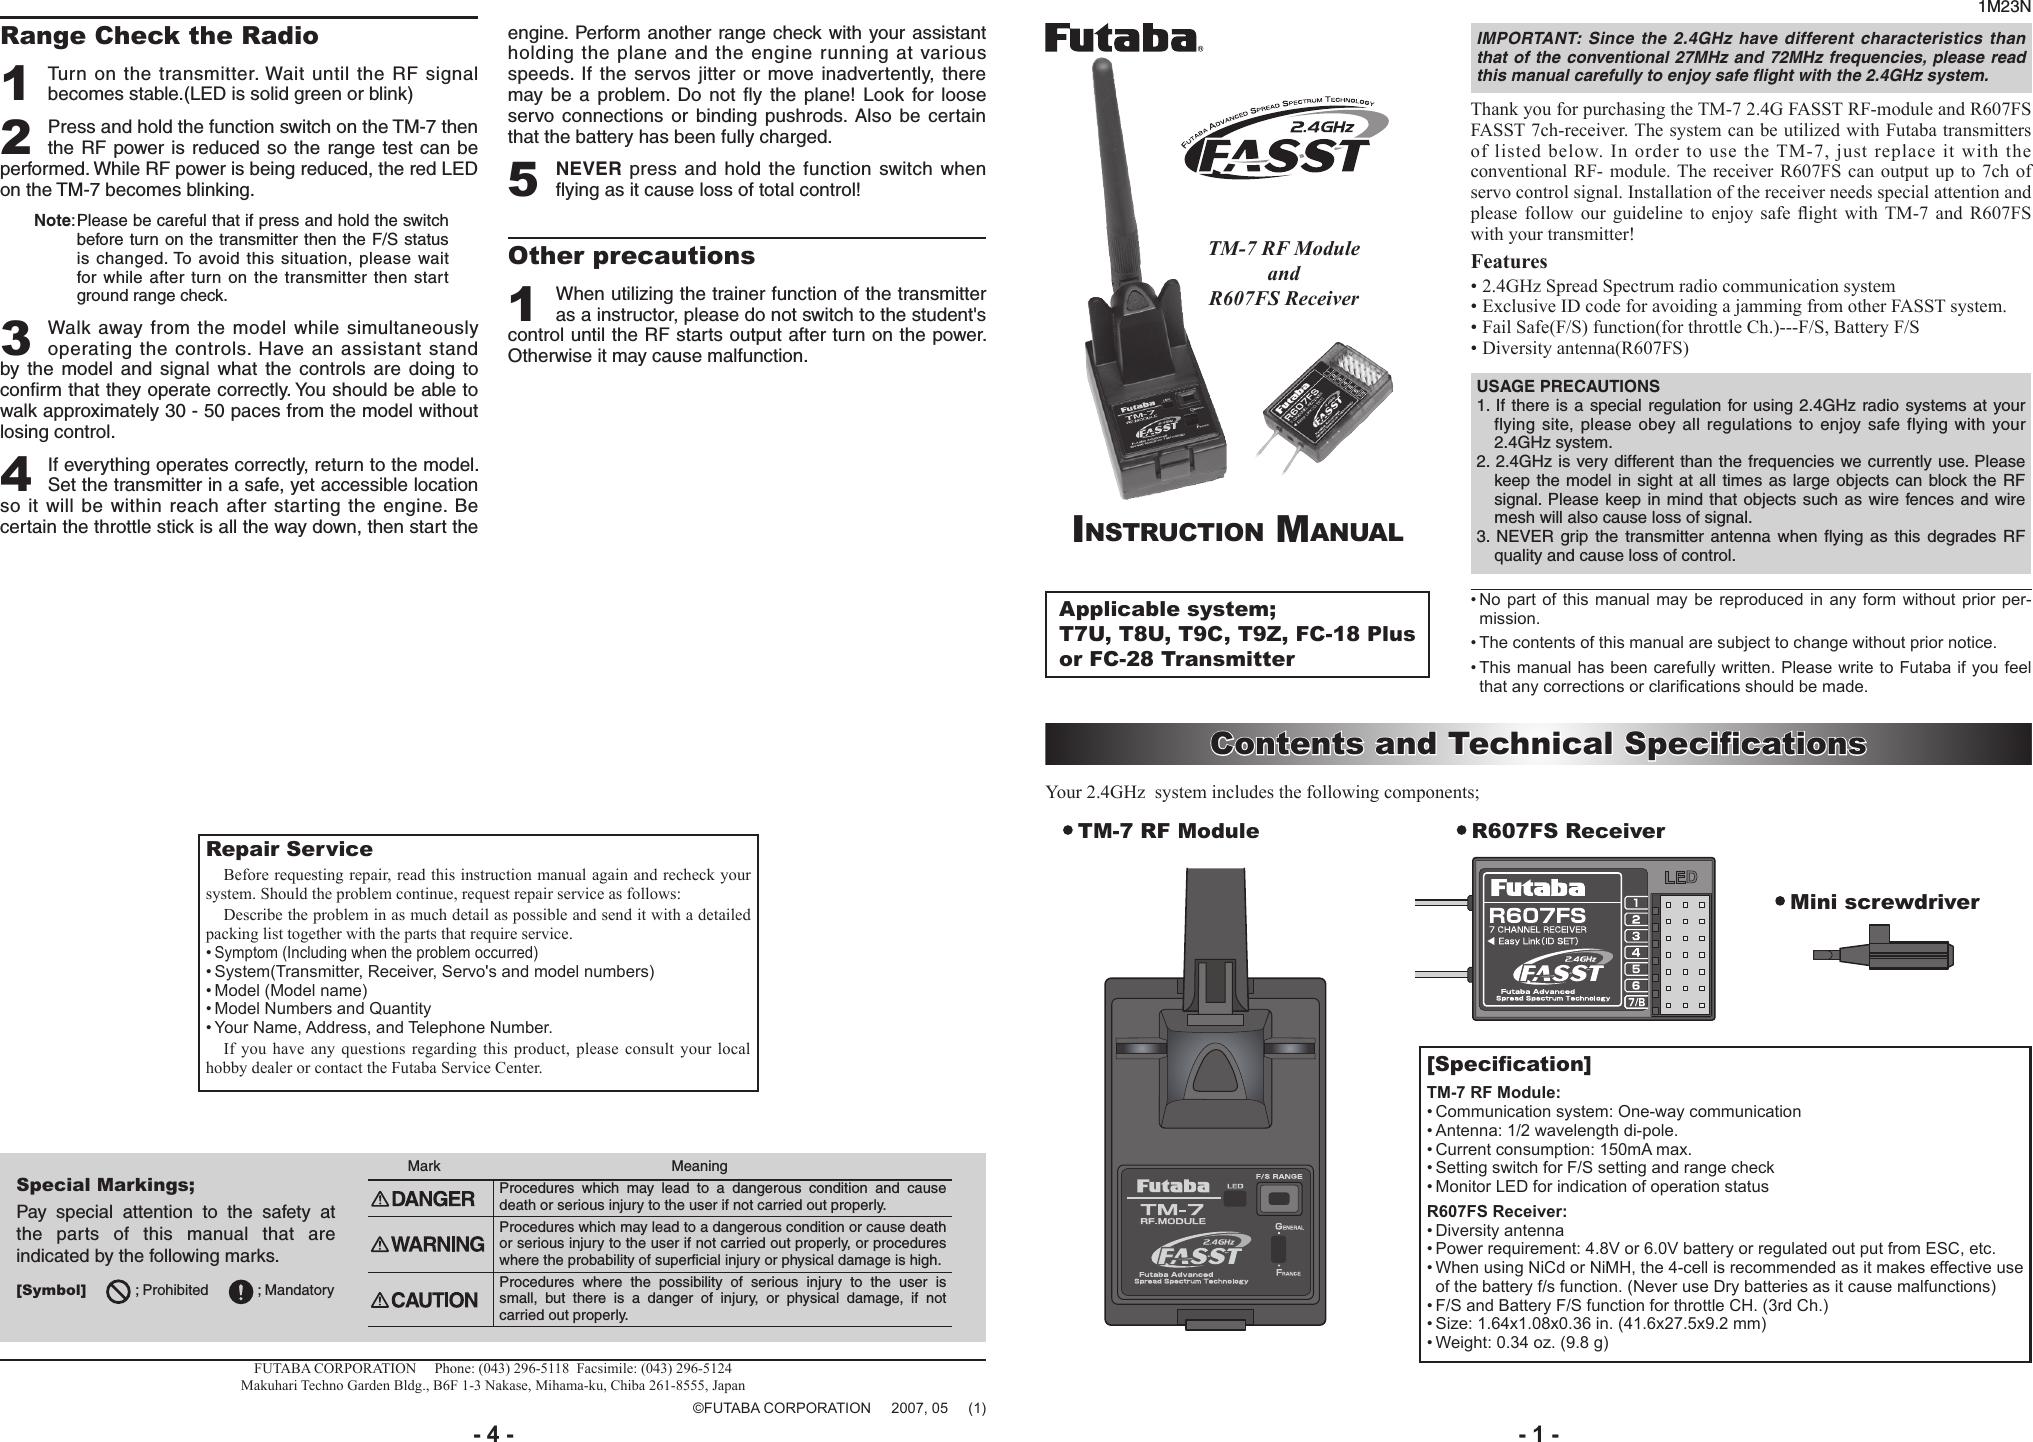 Quia 9ap Chapter 28 Manual Guide